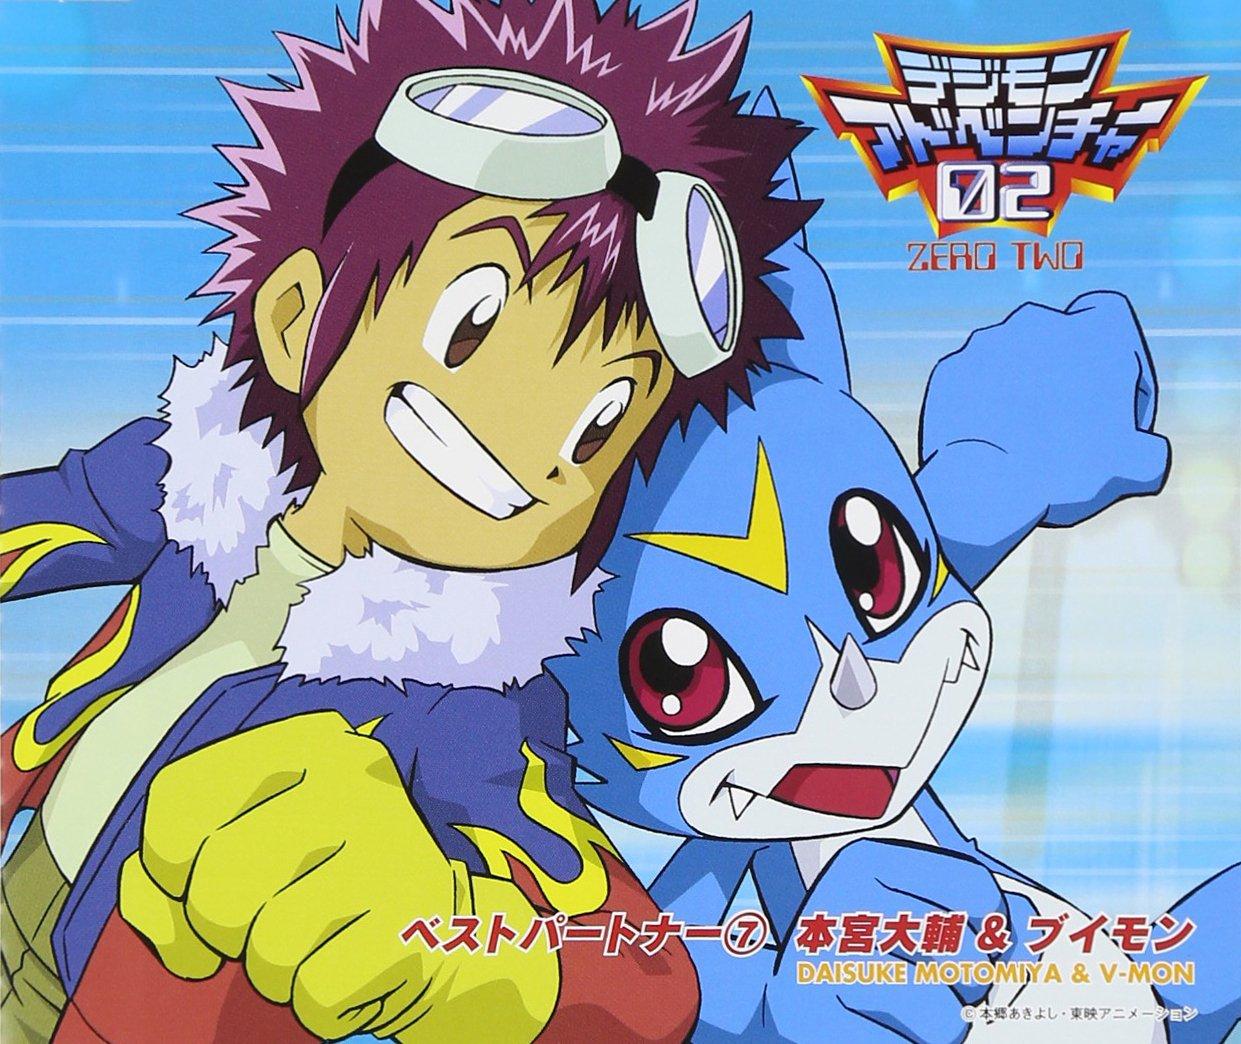 Digimon Adventure 02 Best Part: Motomiya Daisuke, V: Amazon.es: Música